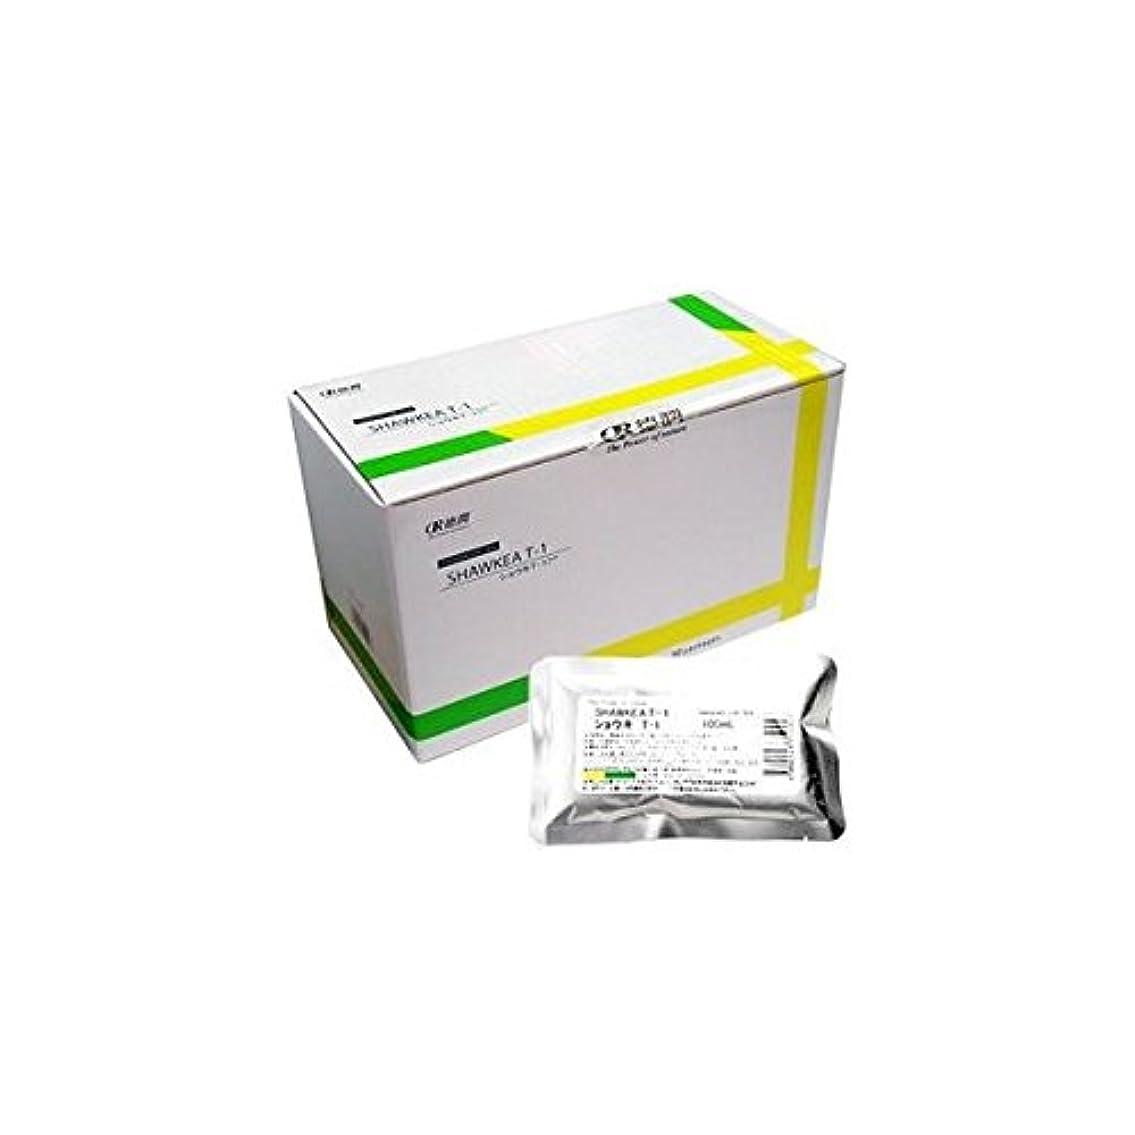 【P&G】ウエラトーン ツープラスワン(2+1) クリーム 7G(60g+60gl+7.3ml) (医薬部外品)(お買い得3個セット)